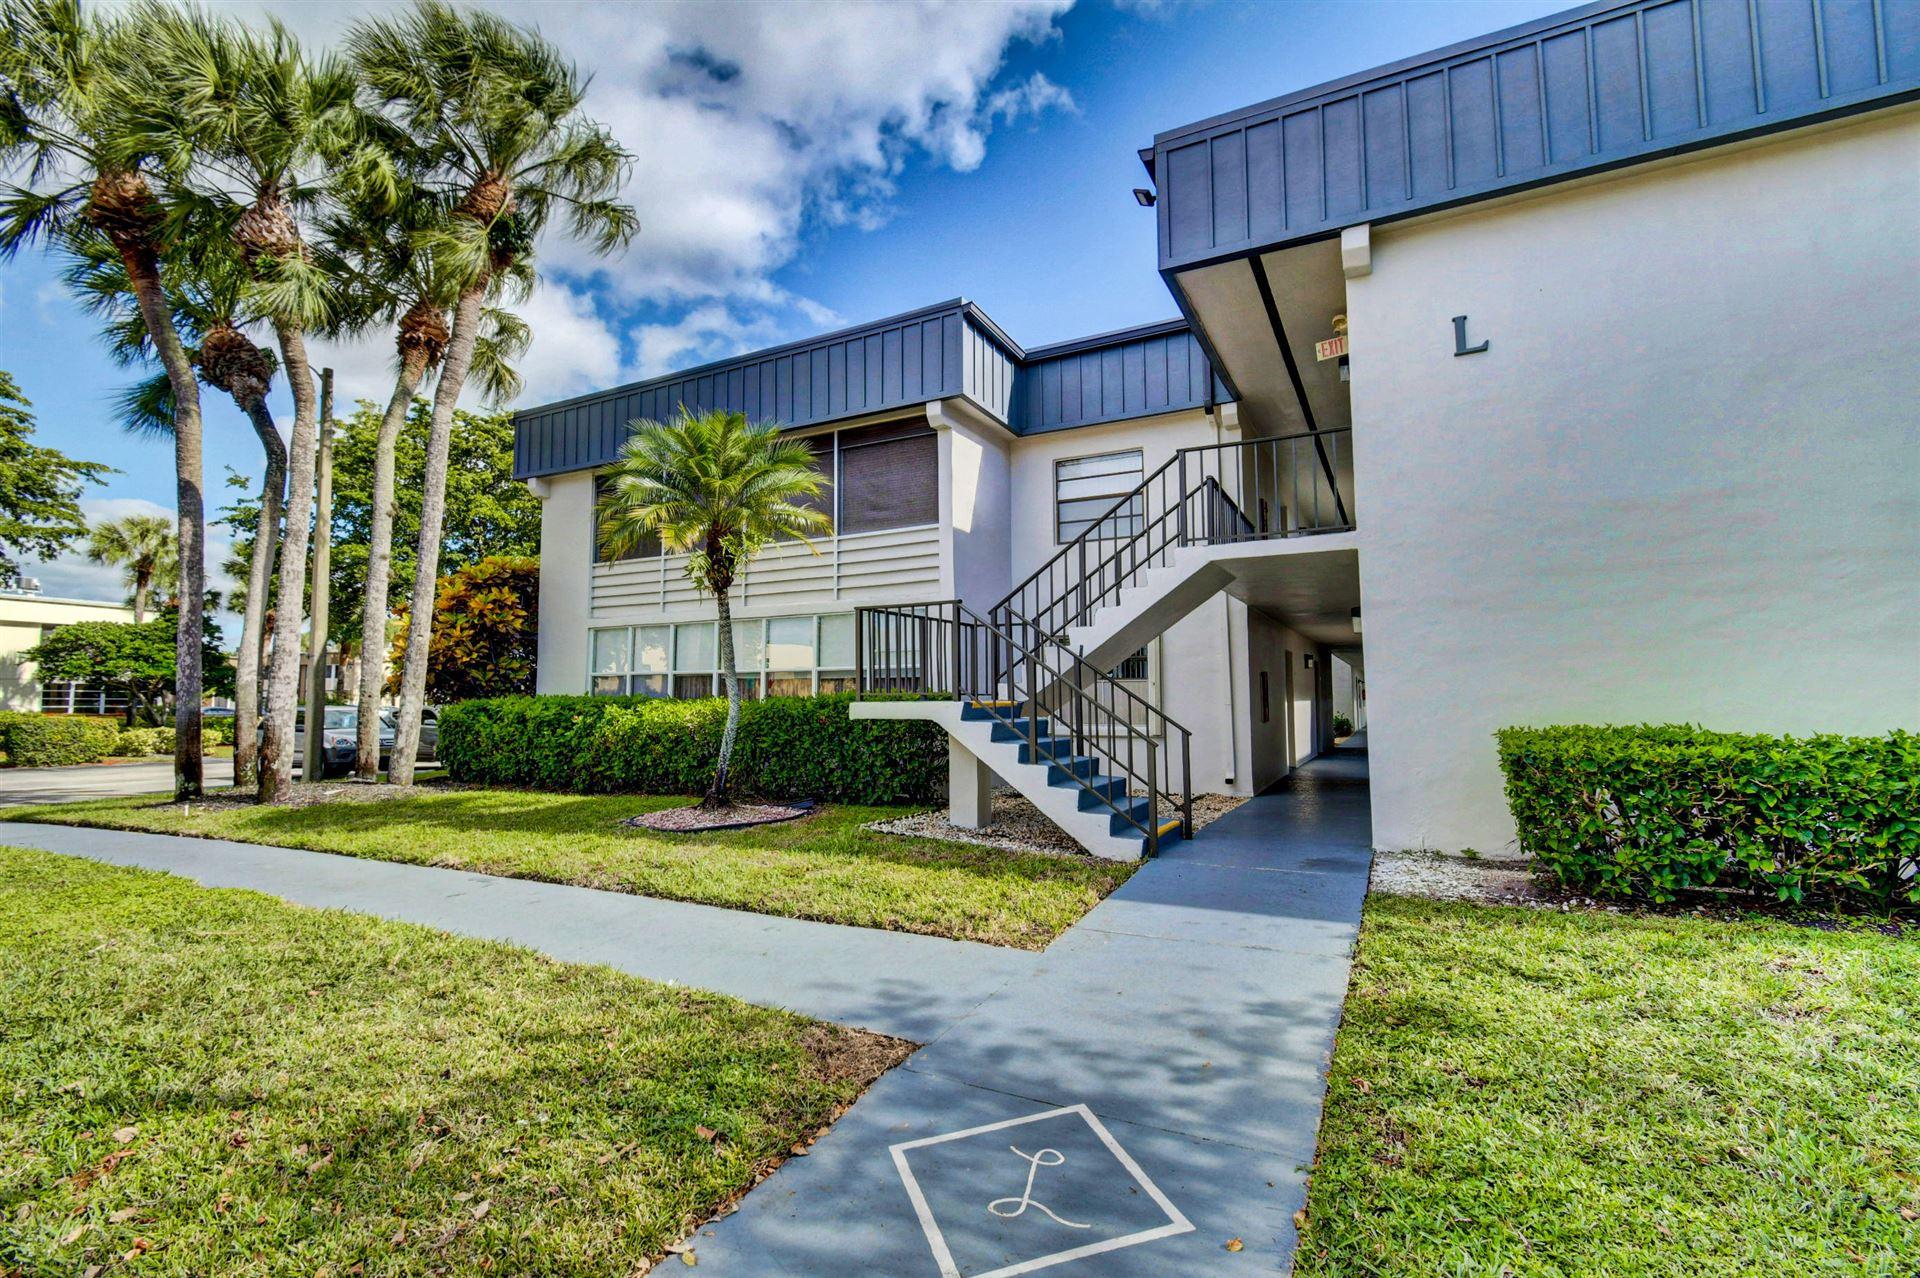 556 Piedmont L, Delray Beach, FL 33484 - MLS#: RX-10676060